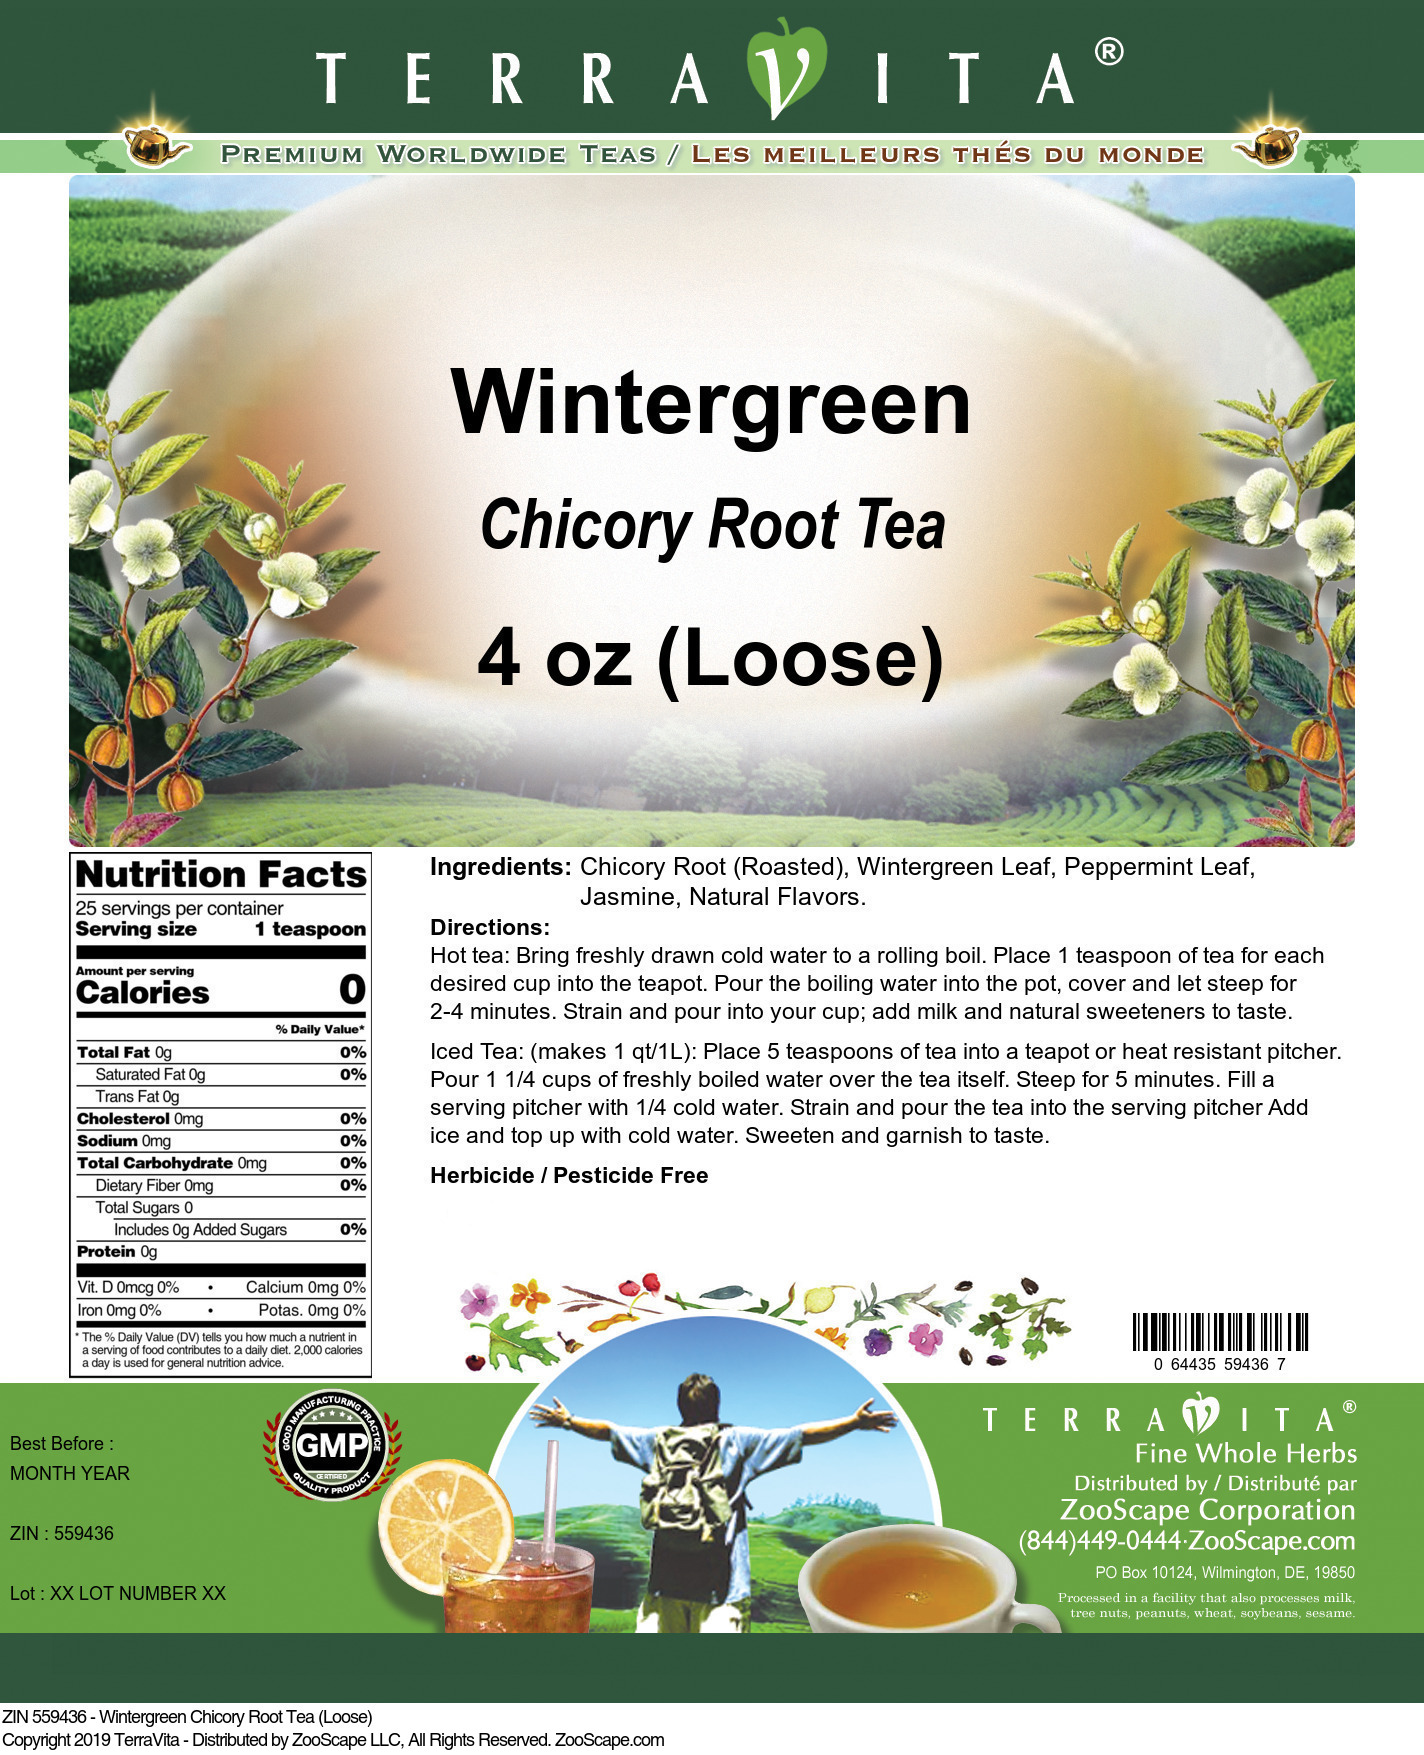 Wintergreen Chicory Root Tea (Loose)